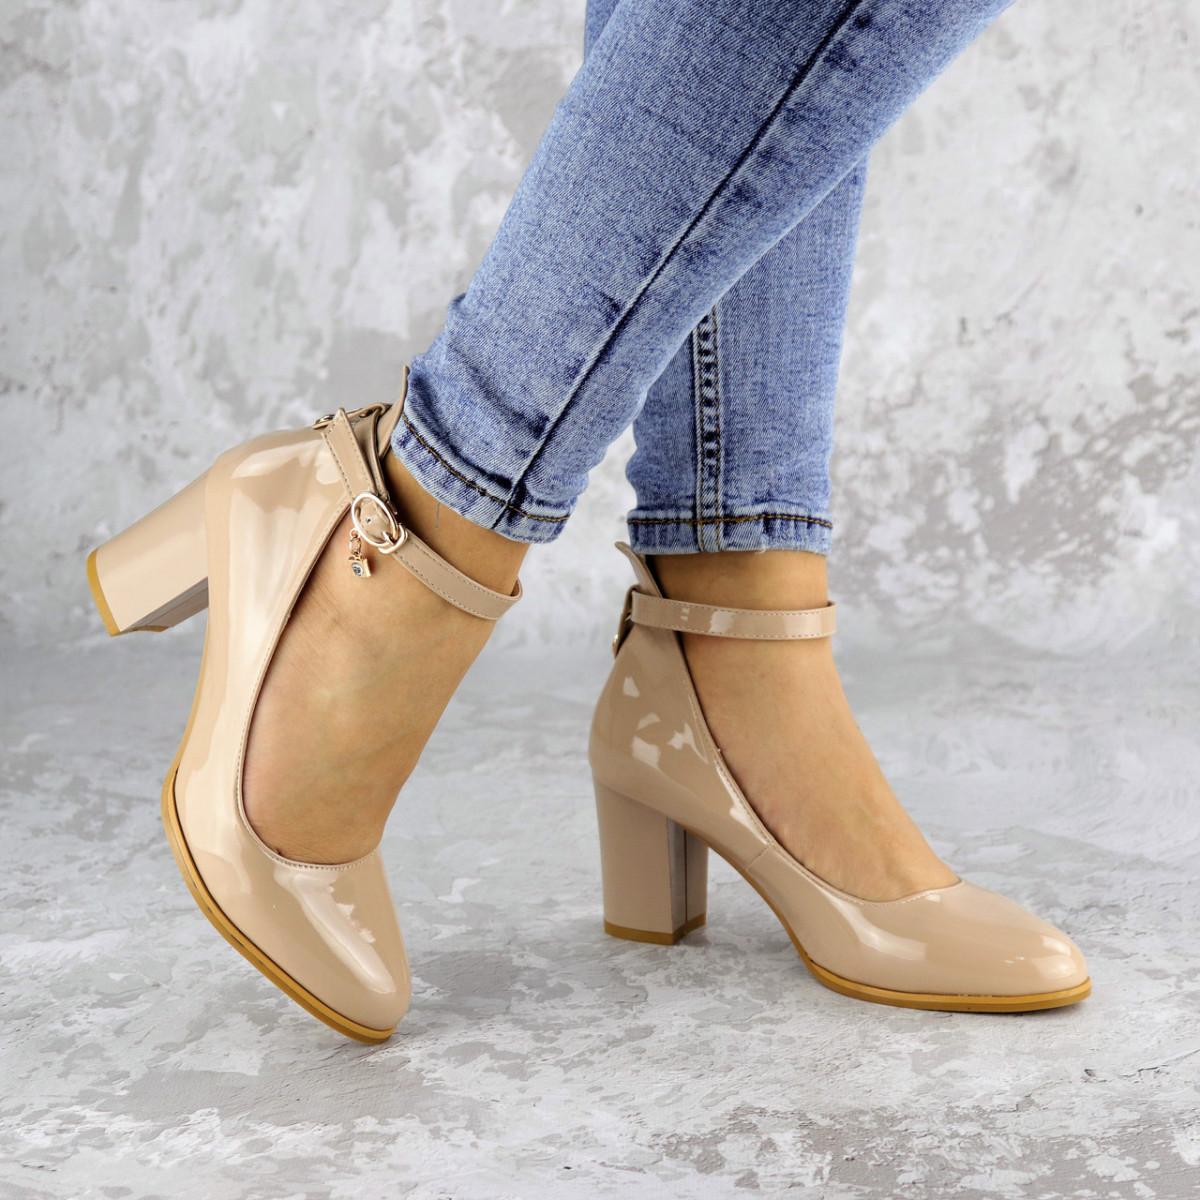 Женские туфли на каблуке бежевые Curly 2199 (36 размер)